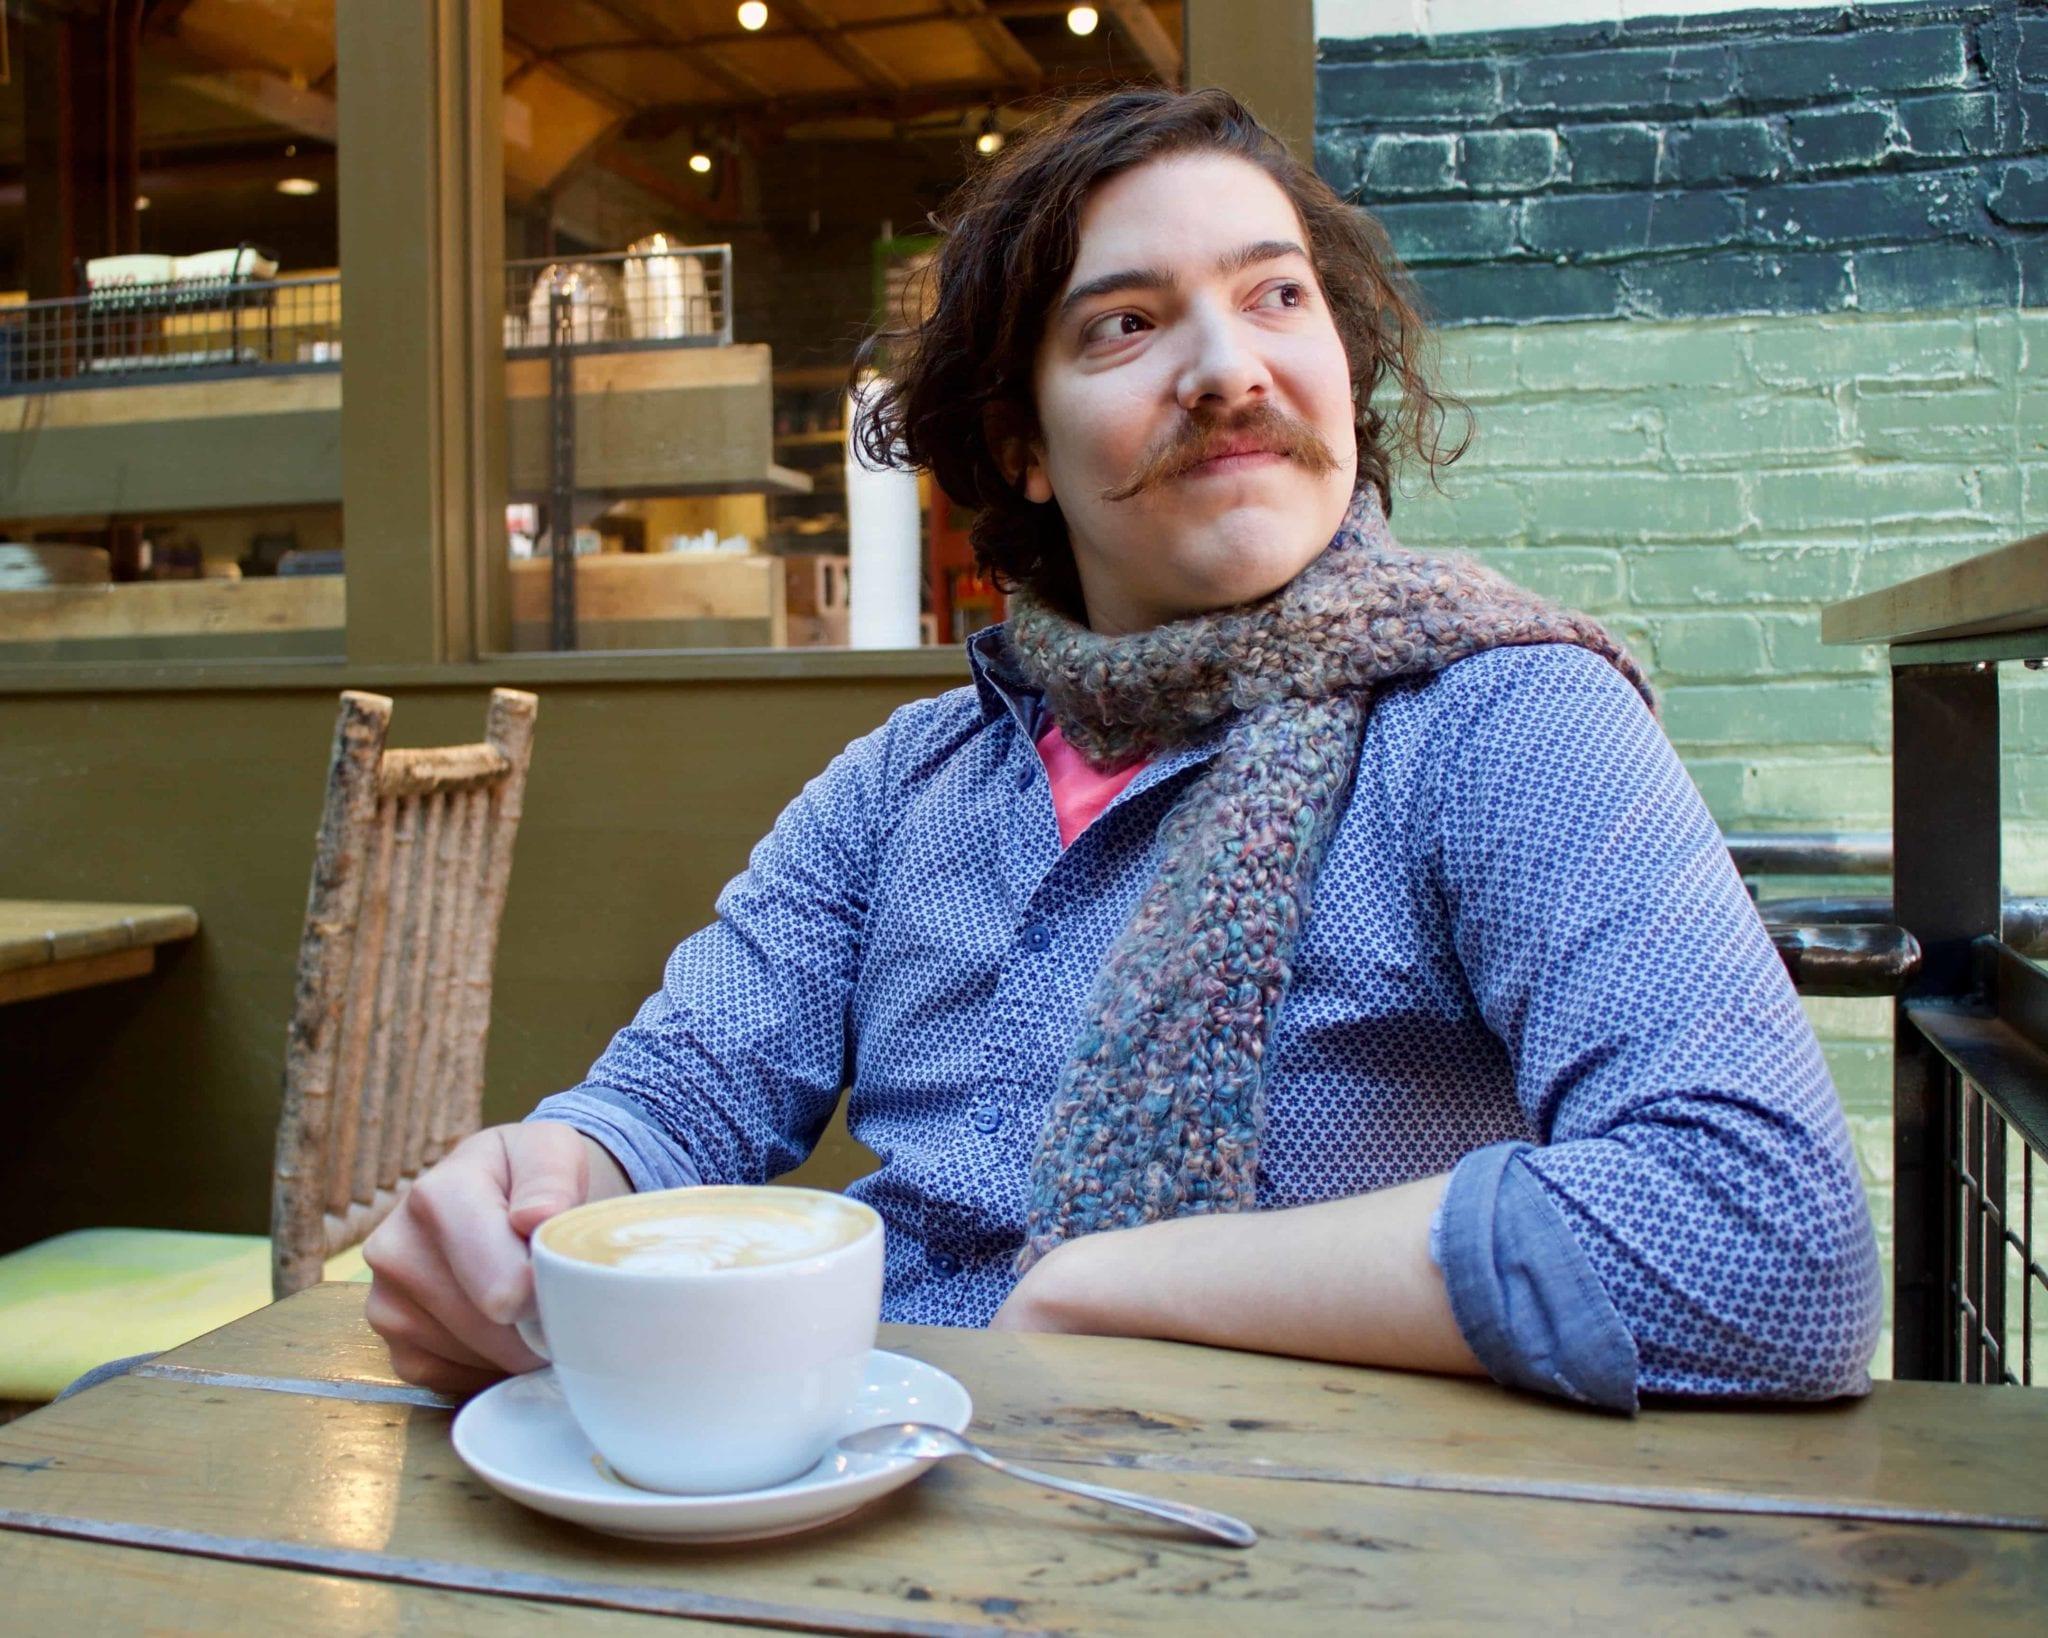 Minimalist Hipster Buys $6 Coffee